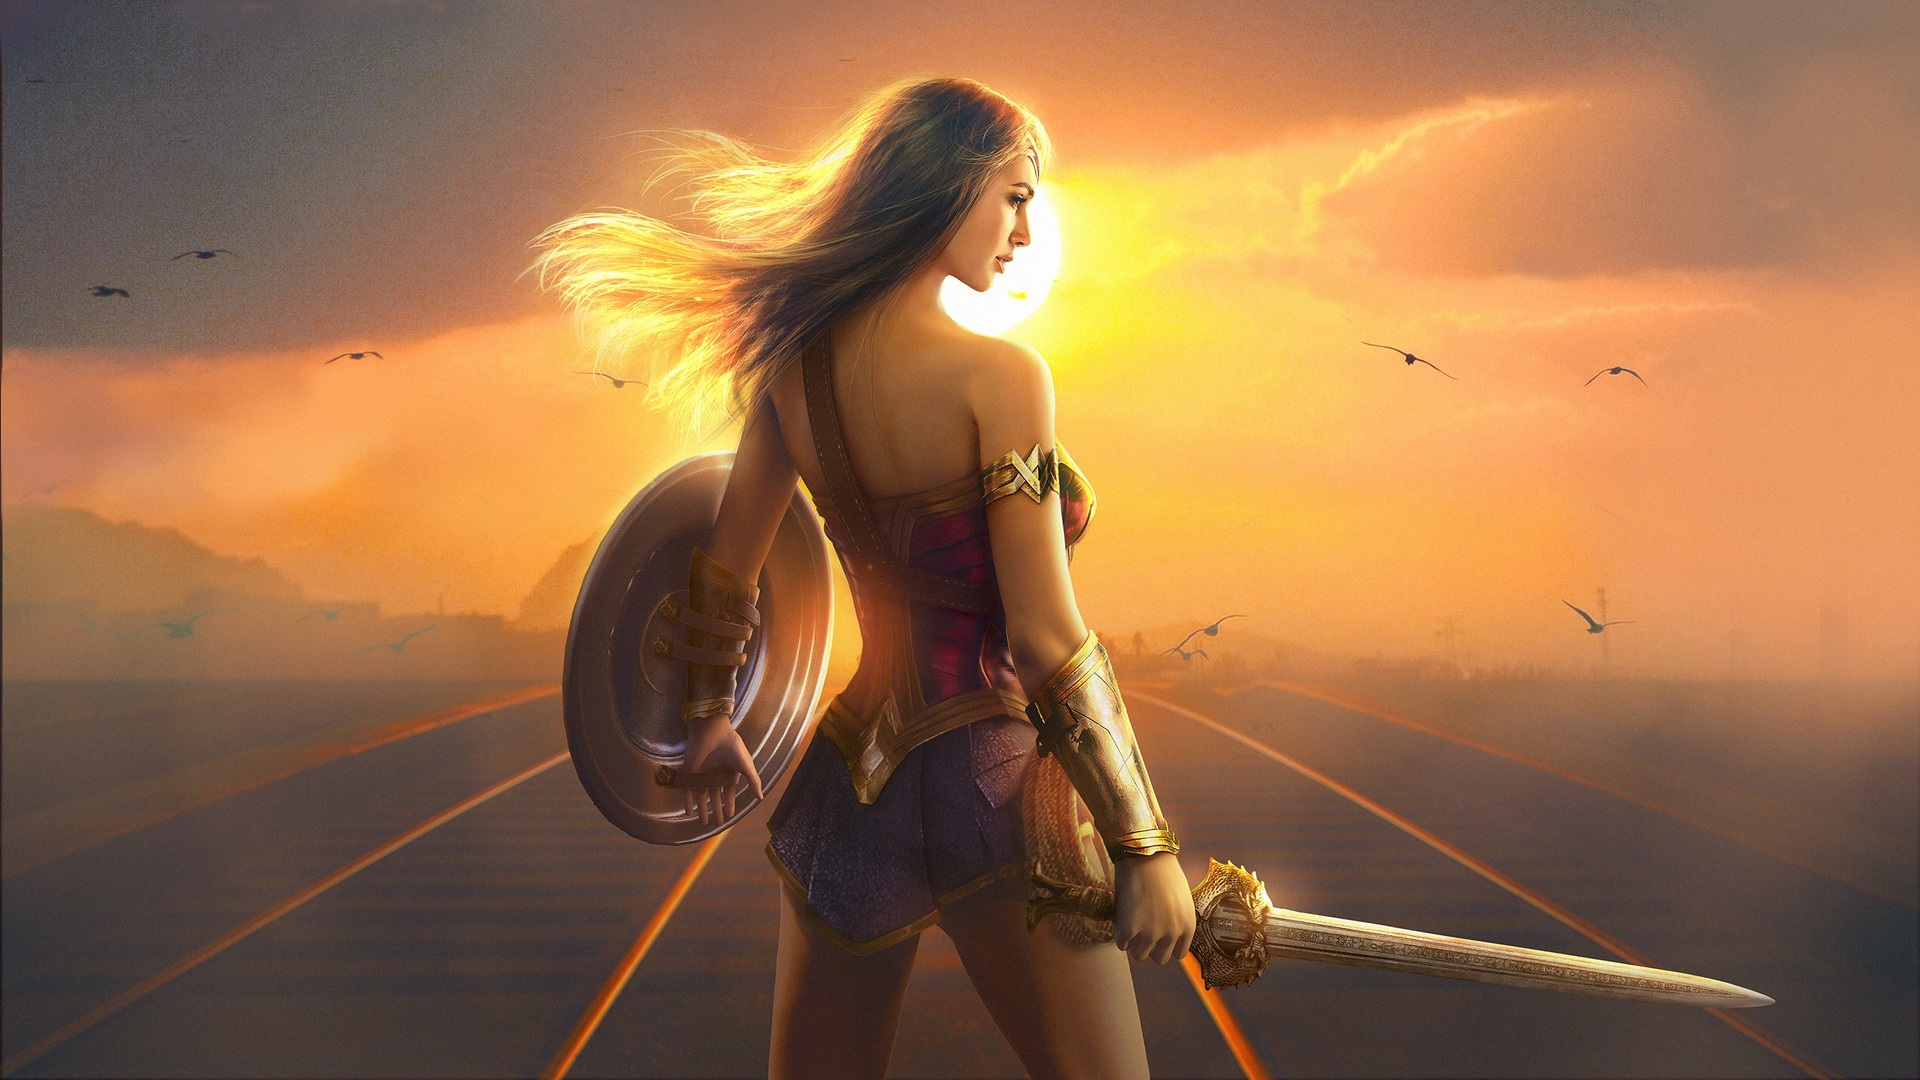 Wallpaper Wonder Woman Gal Gadot Girl Back View 1920x1080 Full